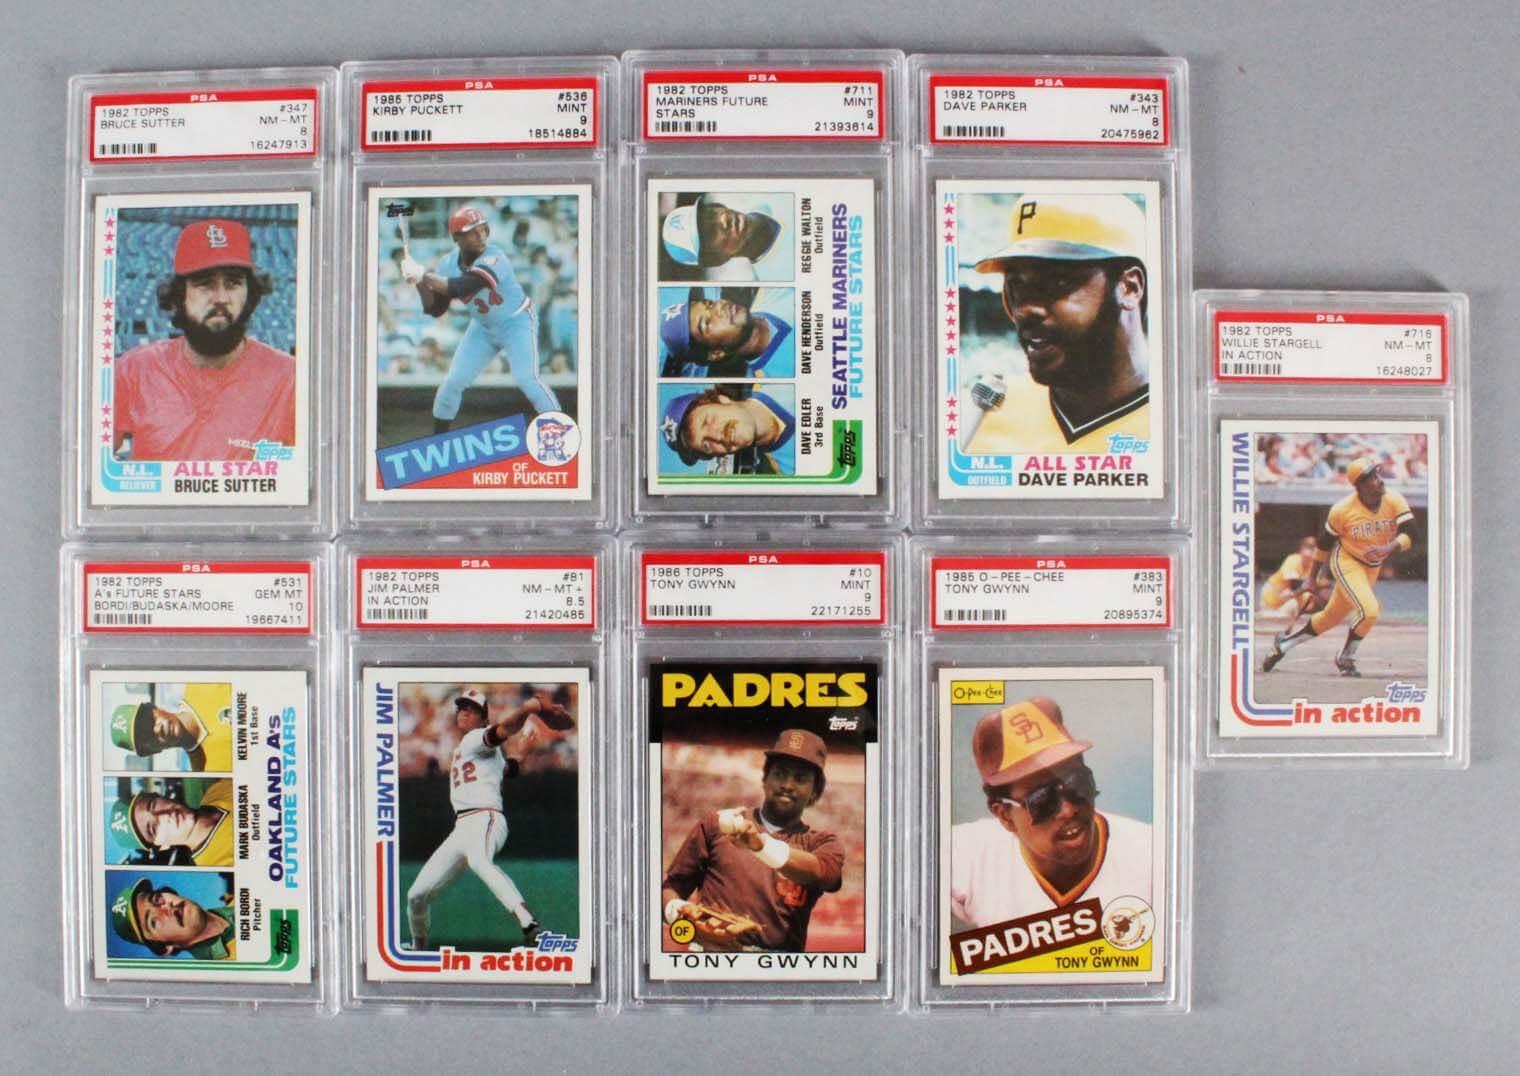 MLB Baseball PSA Graded Card Lot (9) - Kirby Puckett, Willie Stargell, etc.